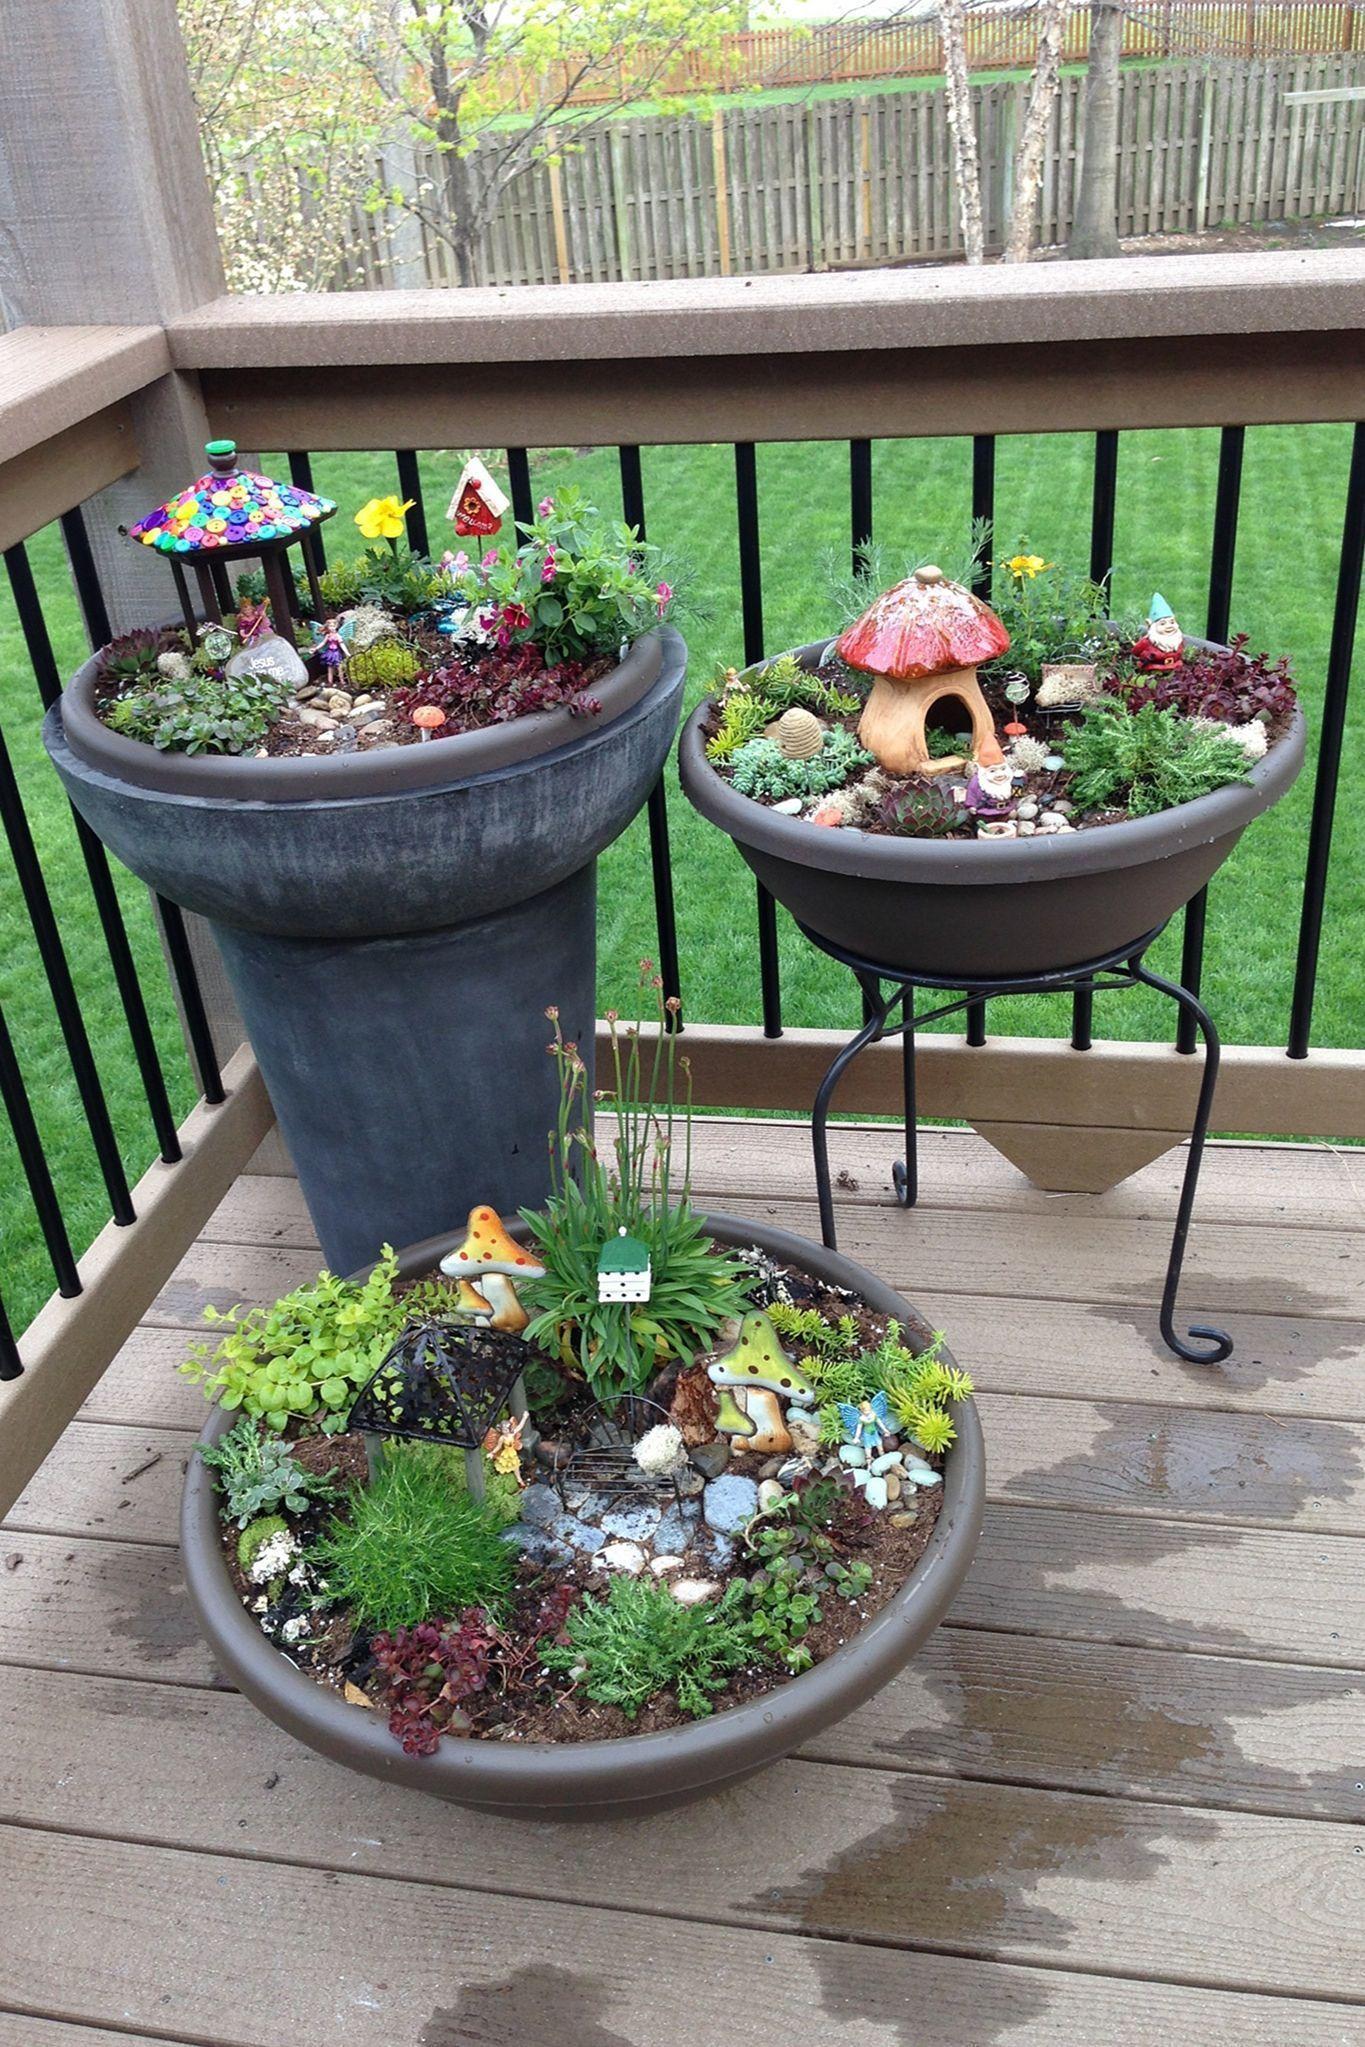 Unique Fairy Garden Ideas 37 (Unique Fairy Garden Ideas 37) design ideas and photos - Fairy garden diy, Mini fairy garden, Fairy garden, Fairy garden designs, Miniature garden, Miniature fairy gardens - Unique Fairy Garden Ideas 37